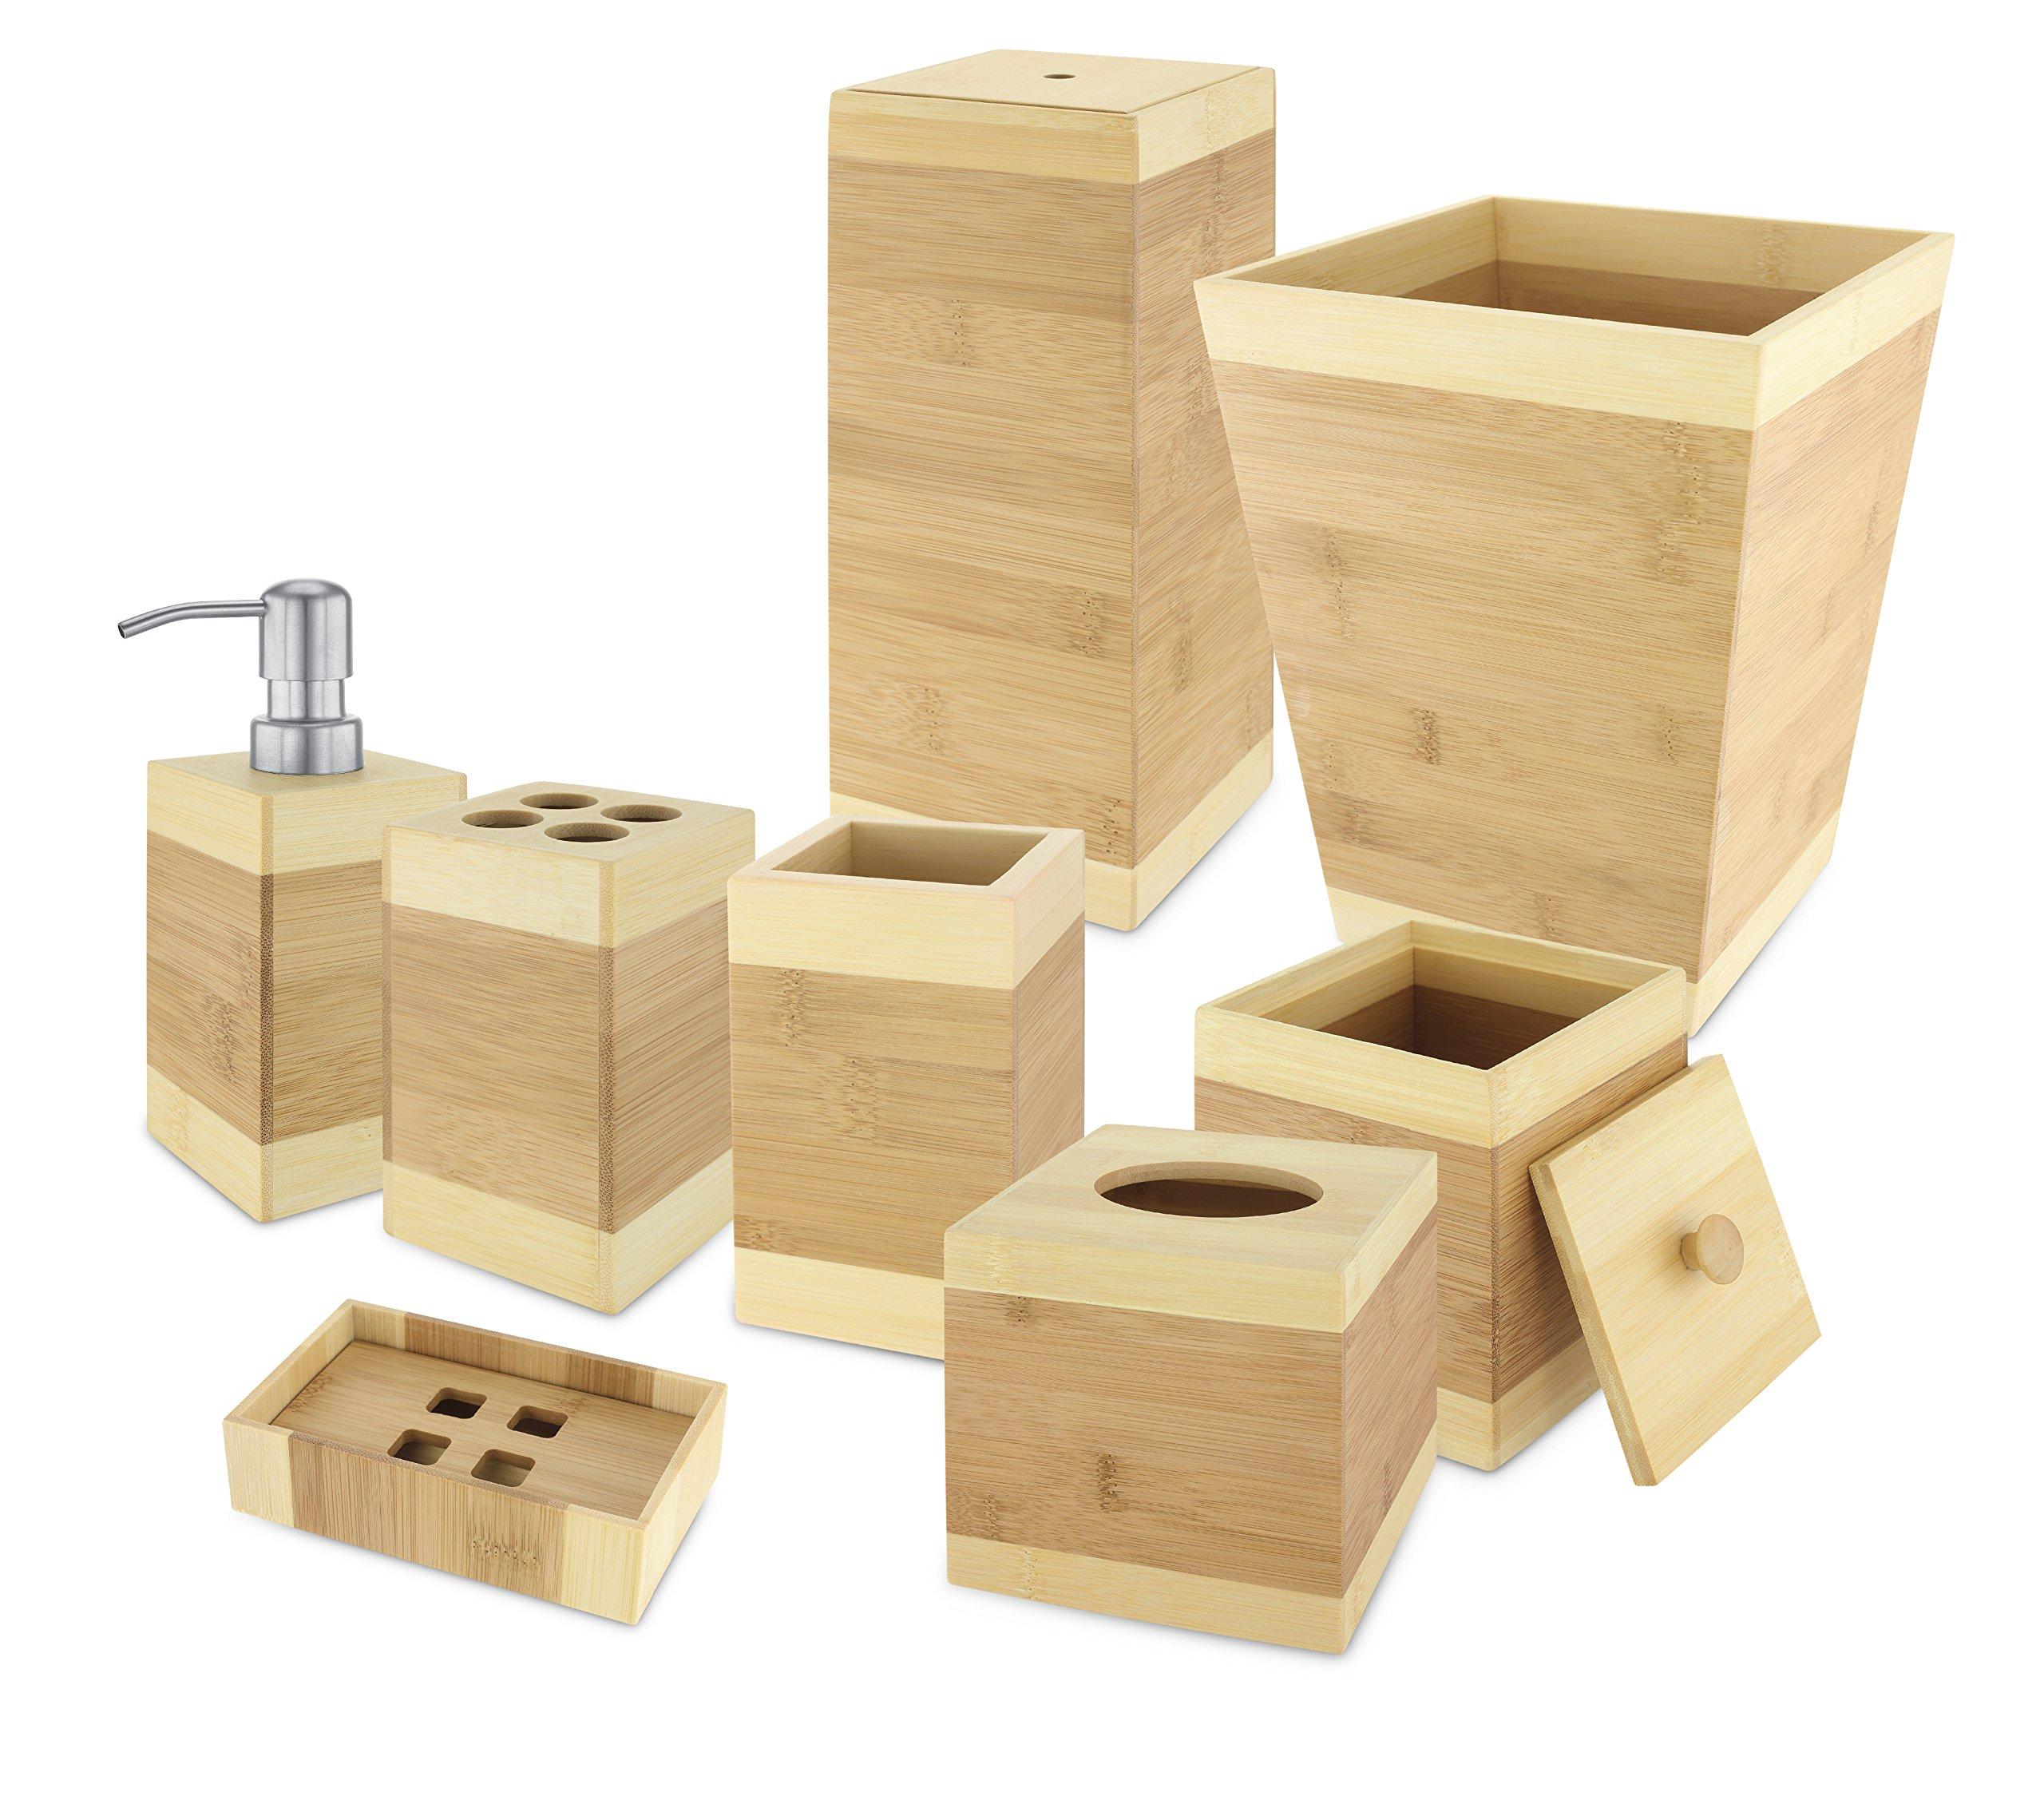 Kovot Bamboo Bathroom Accessories 8 Piece Set - Adds Beautiful Natural Elegan.. 16